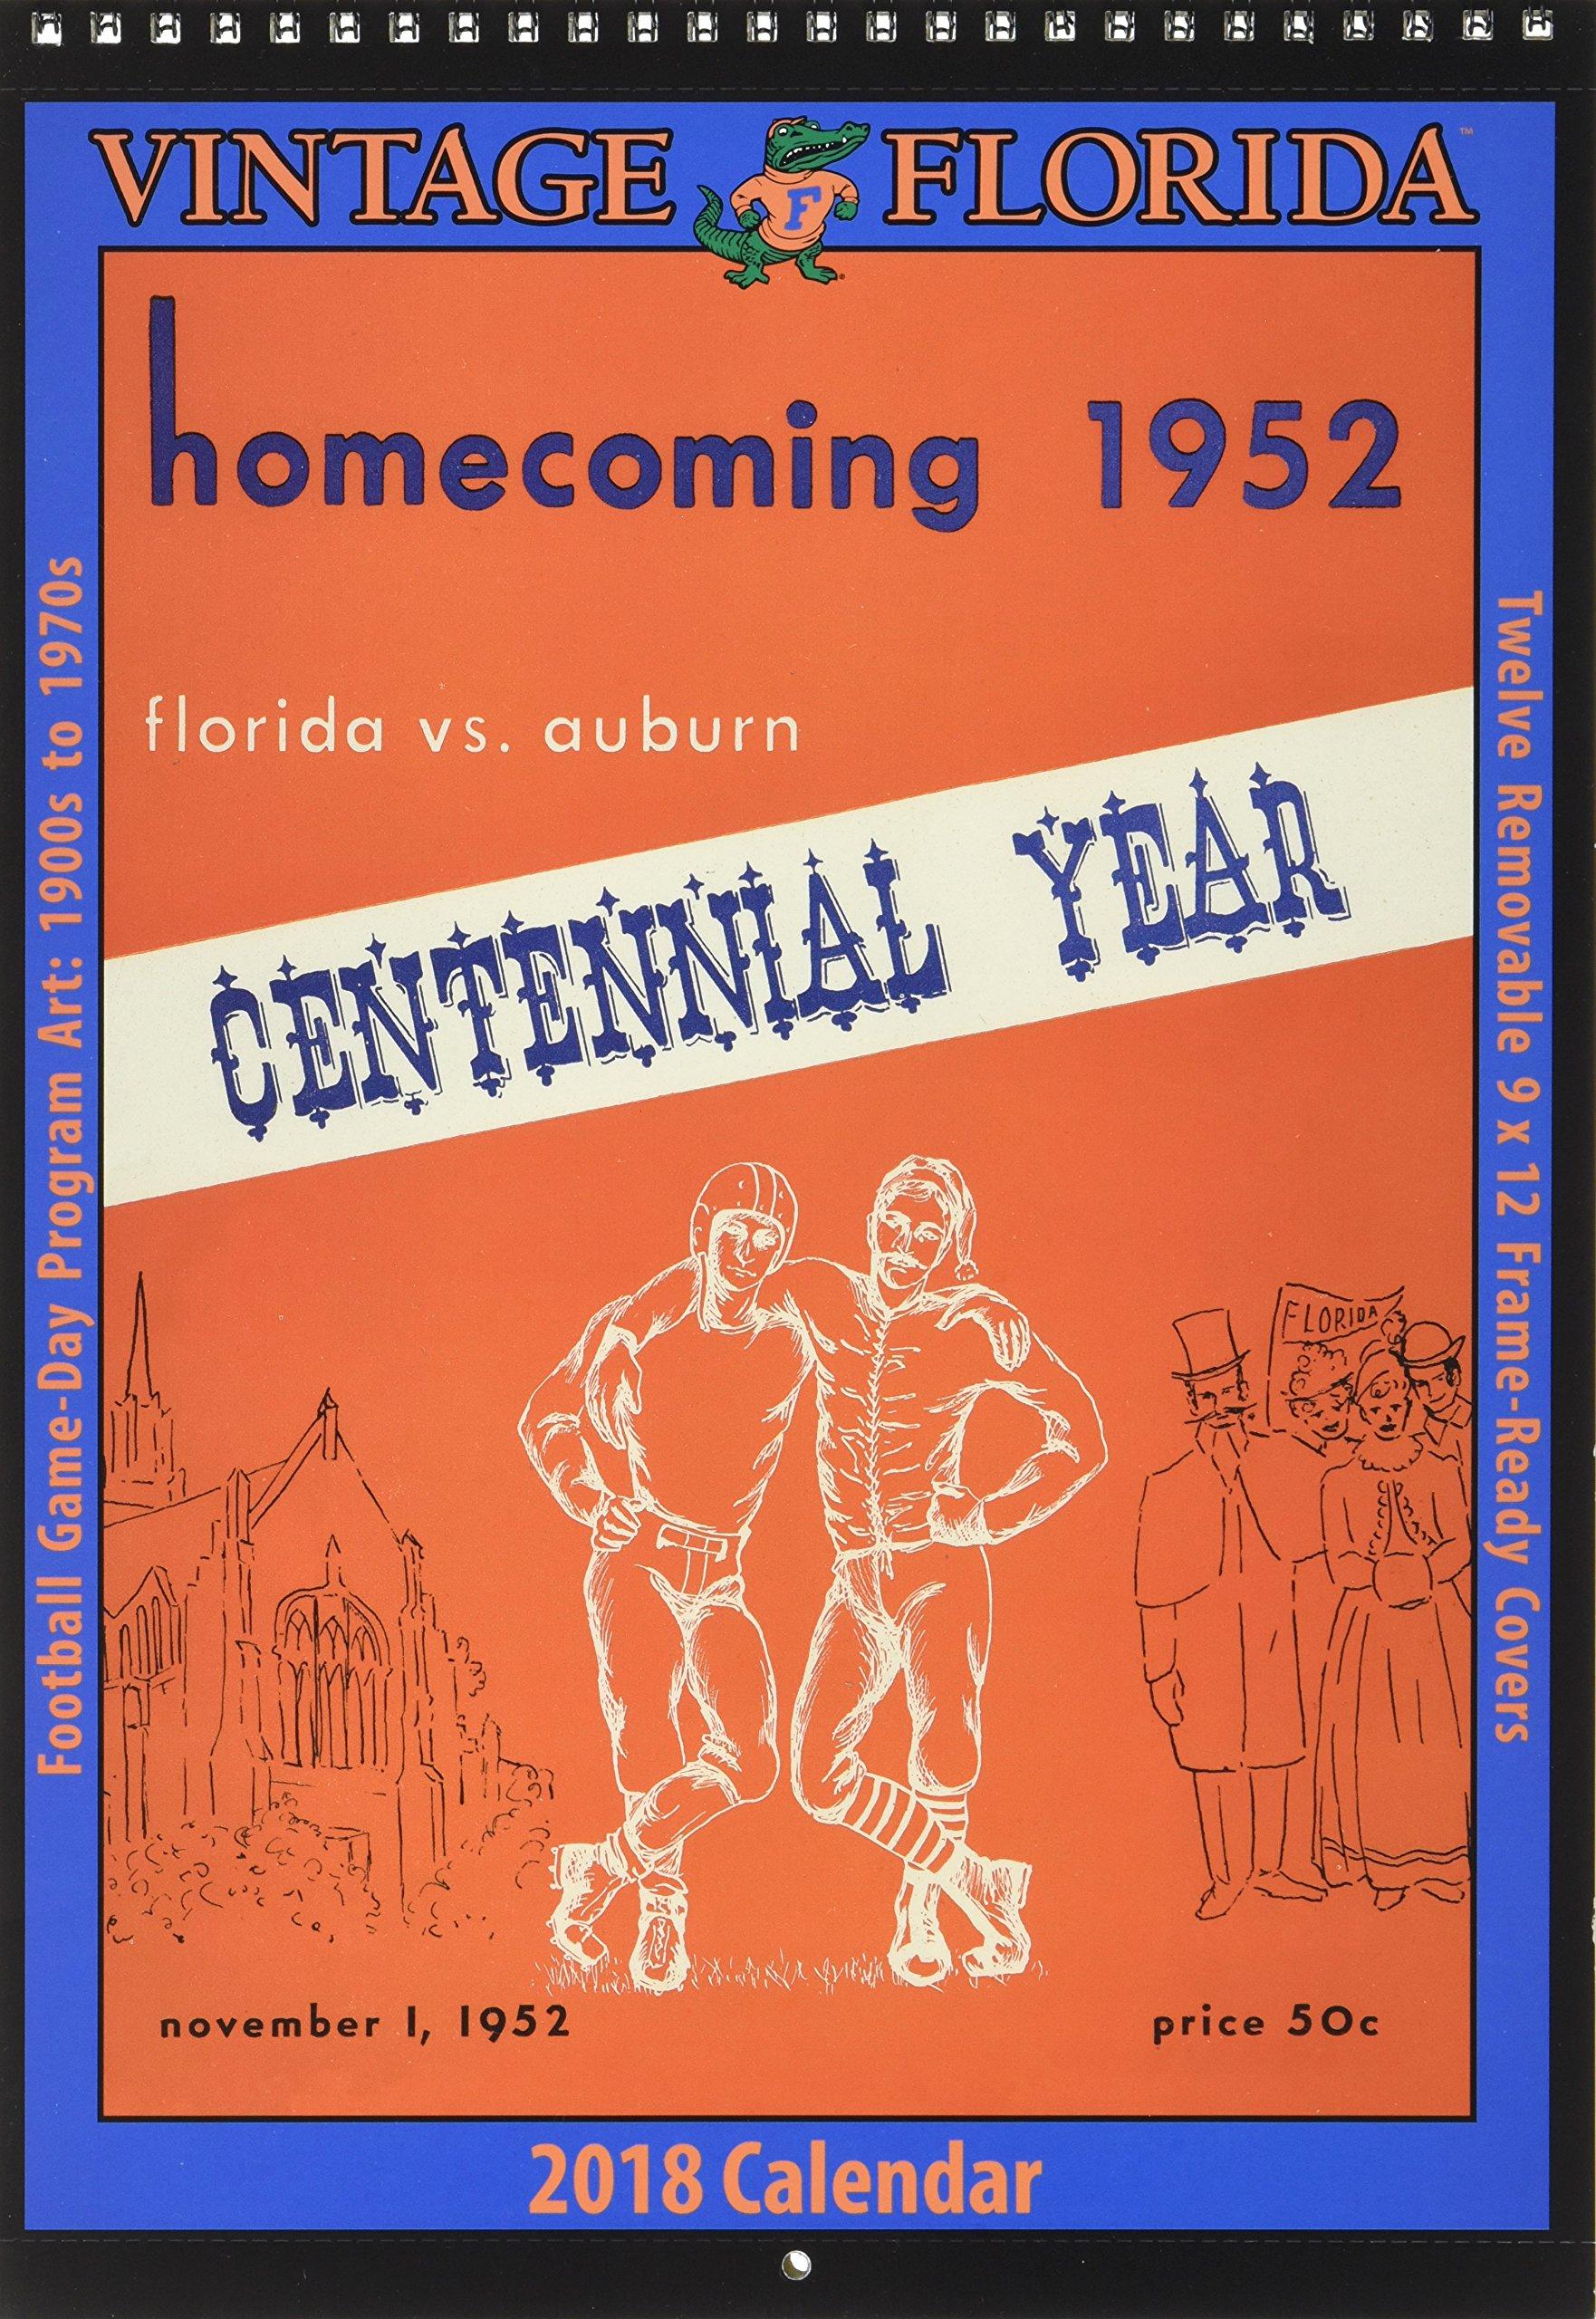 Vintage Florida Gators 2018 College Football Calendar: Football Game-day Program Art: 1900 to 1970s